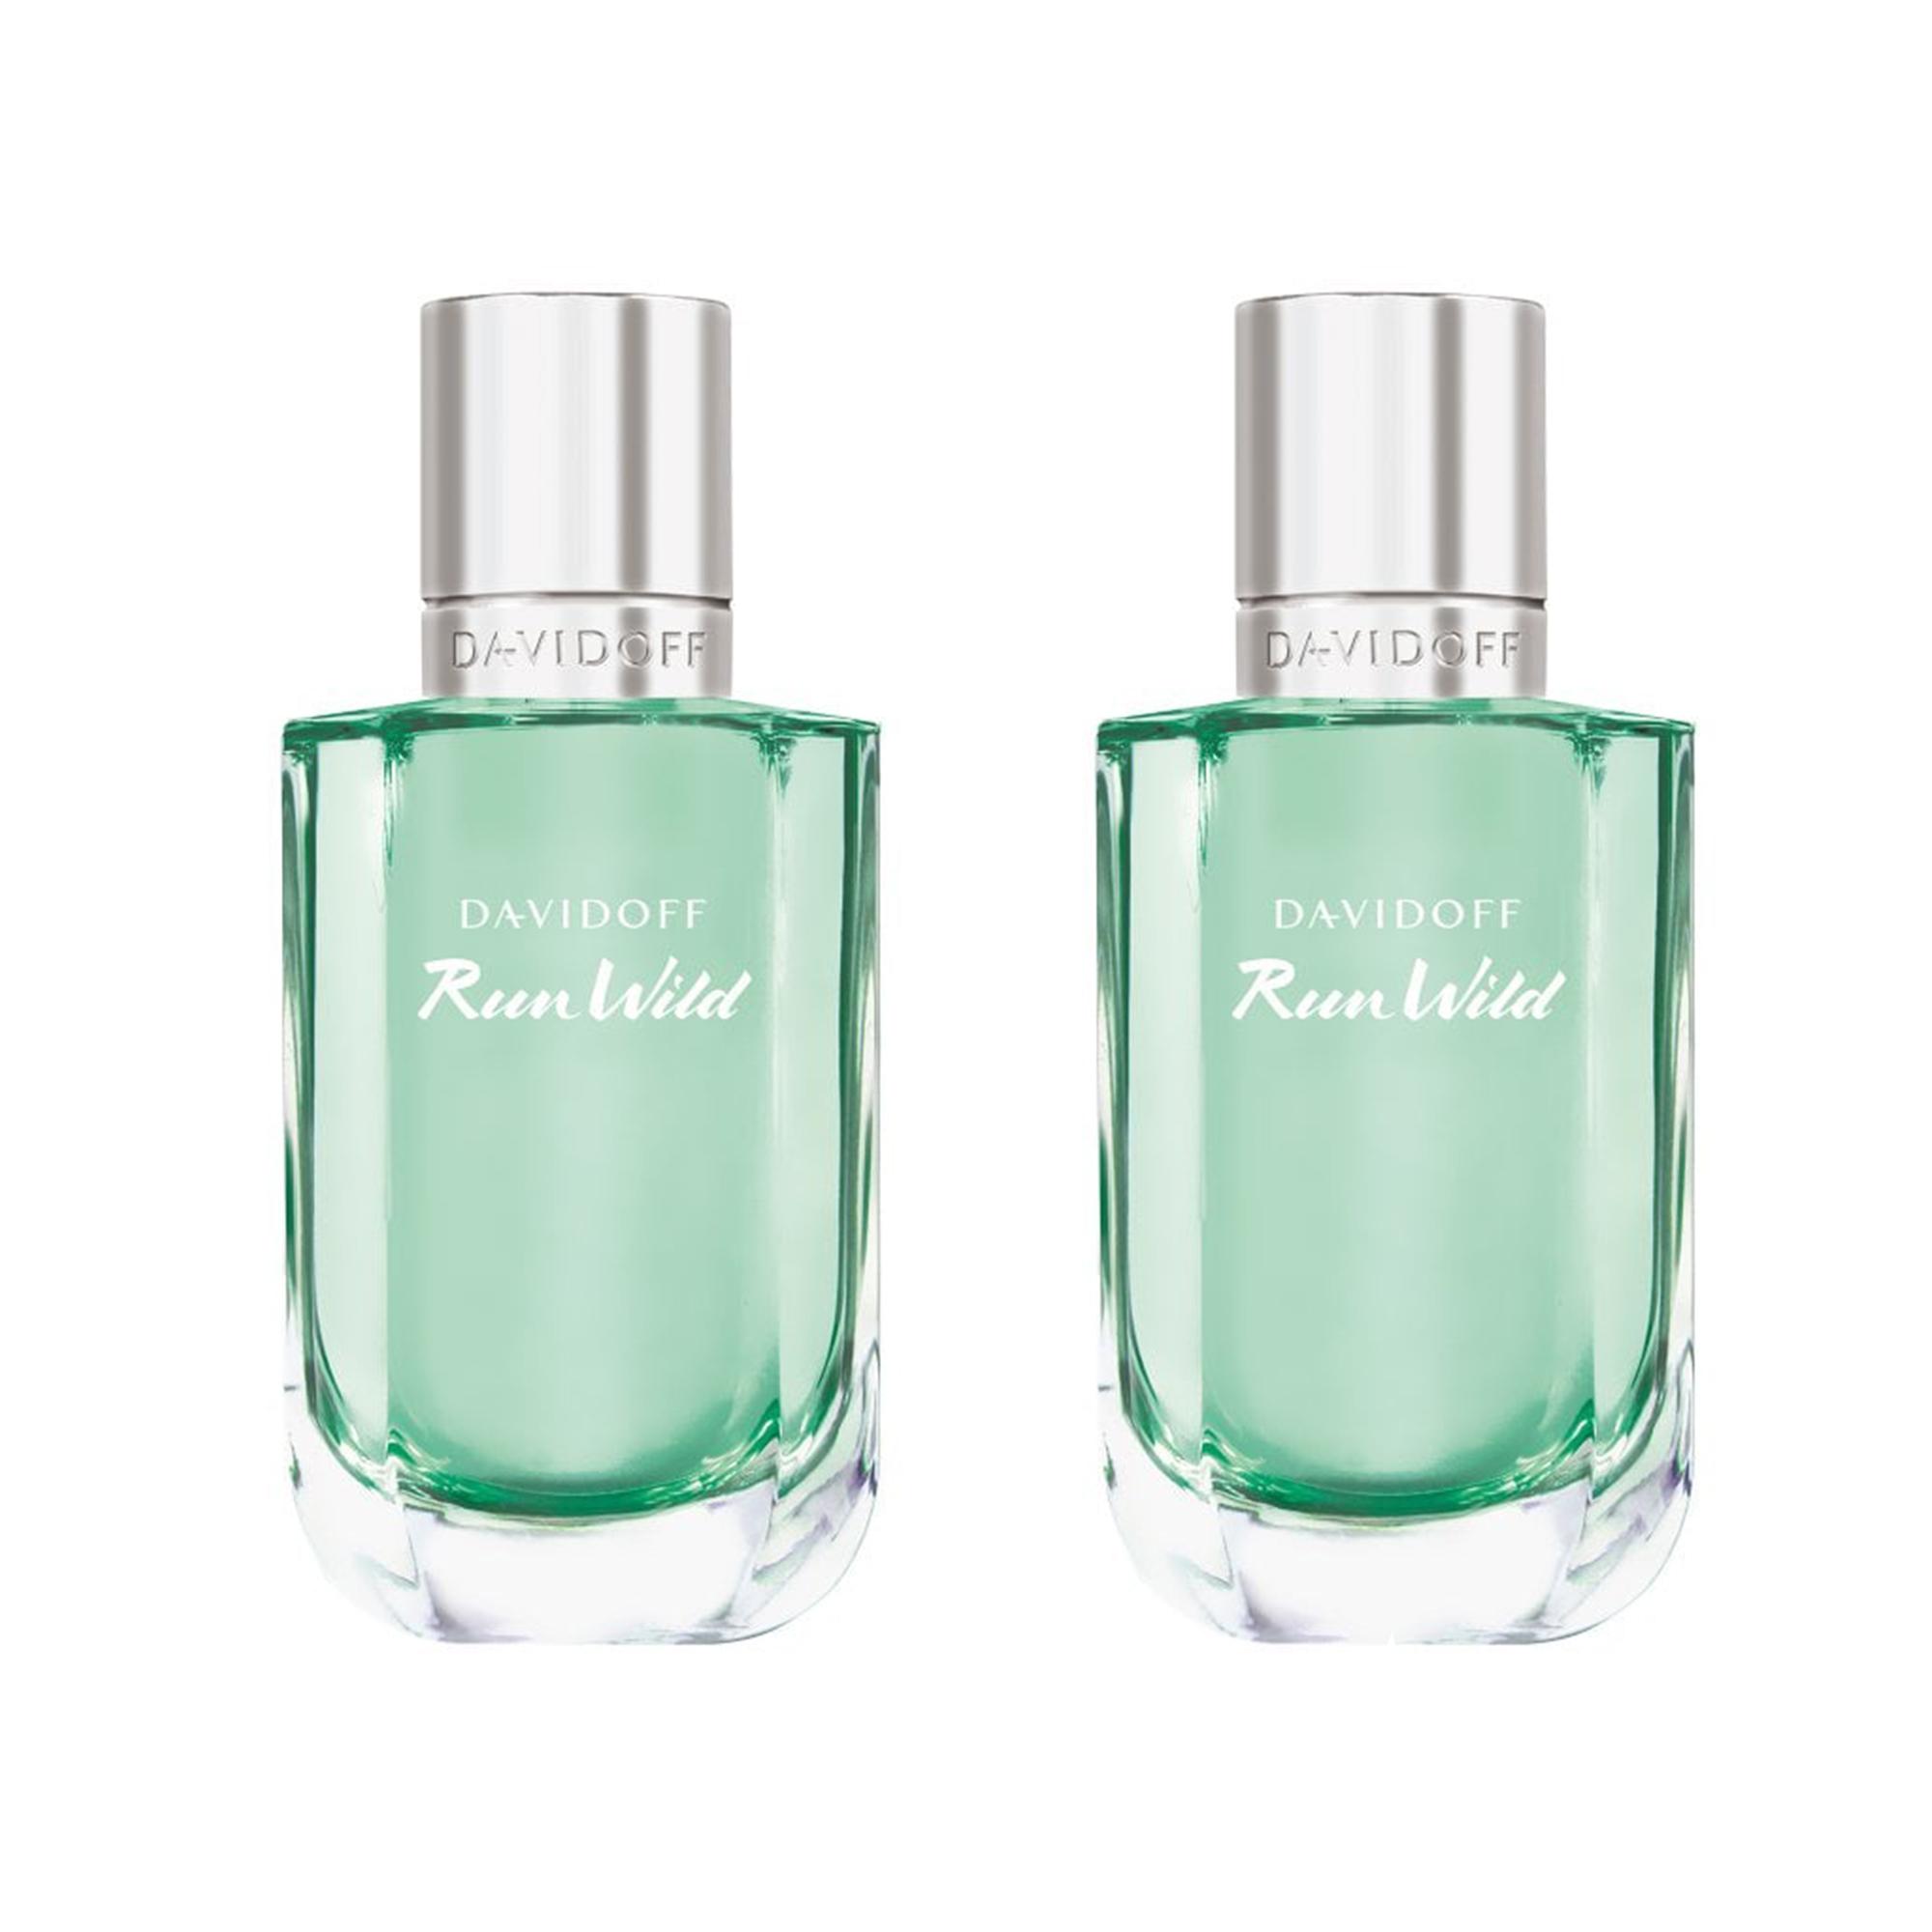 TWO x Bottles of Davidoff Run Wild For Her 100ml Eau De Parfum £25 + Free UK mainland delivery using code @ Beauty Base